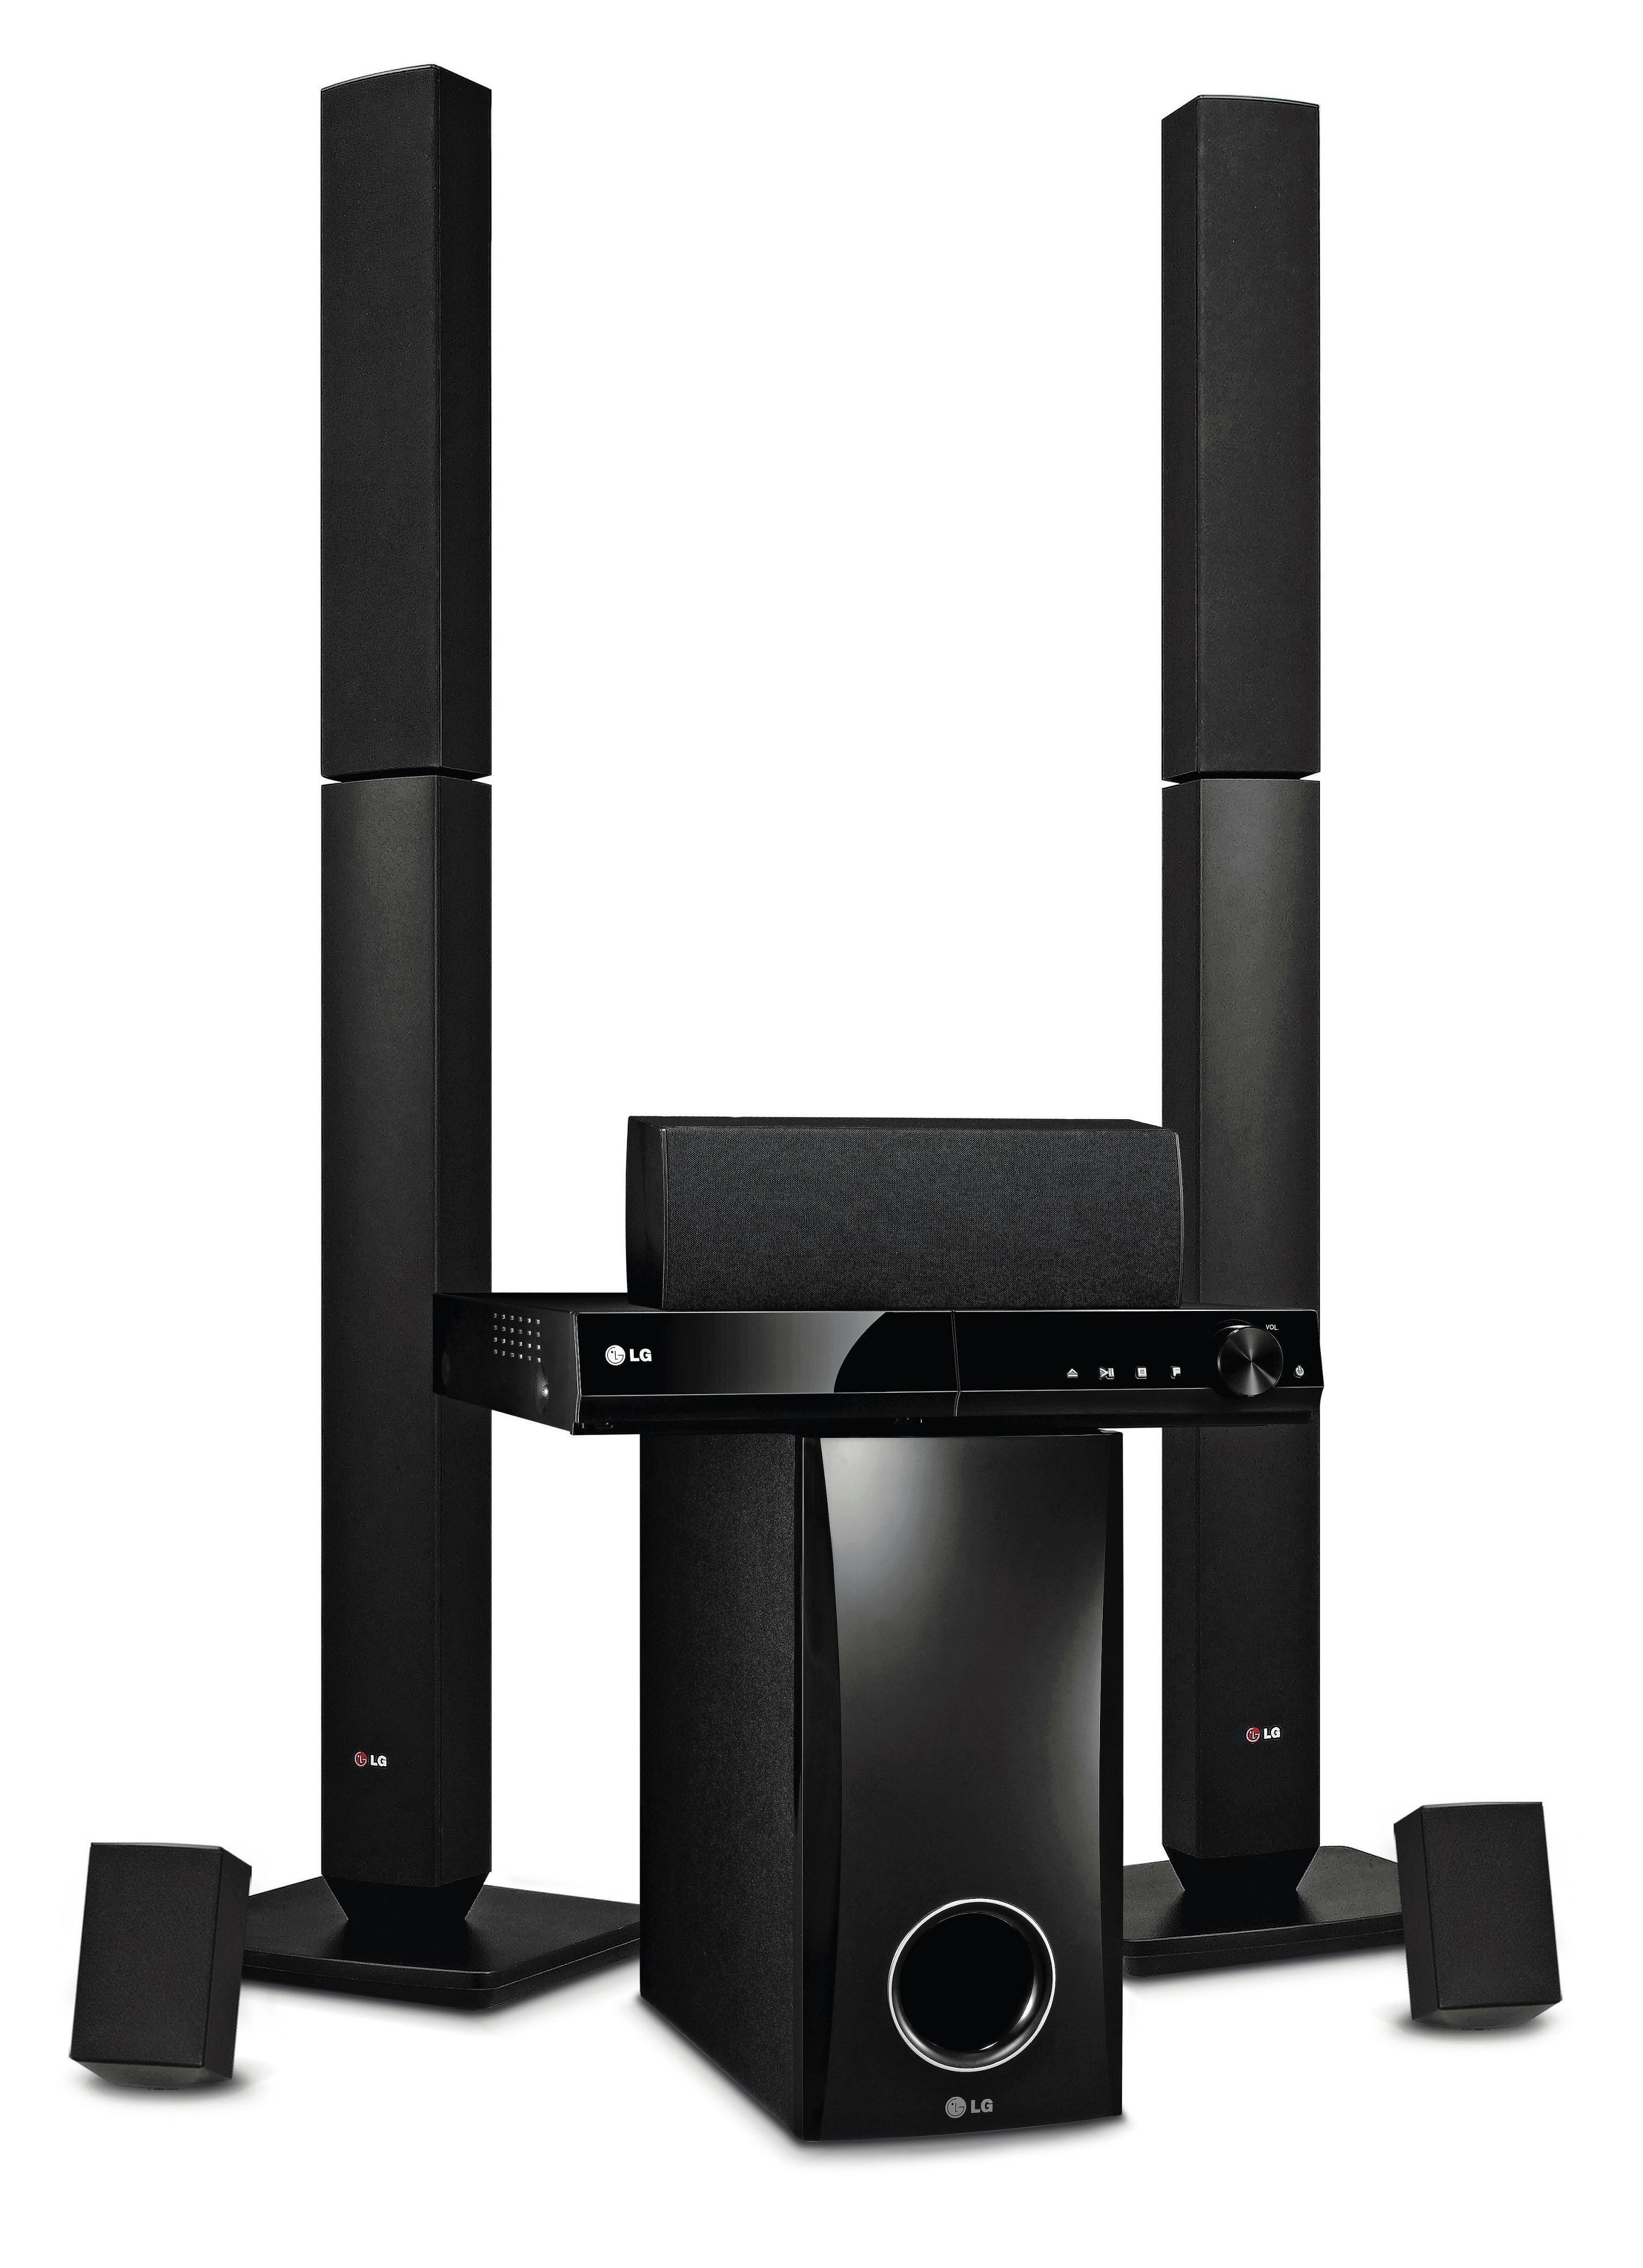 LG LG - DH4430P 330W 5.1Ch DVD Home Cinema System.